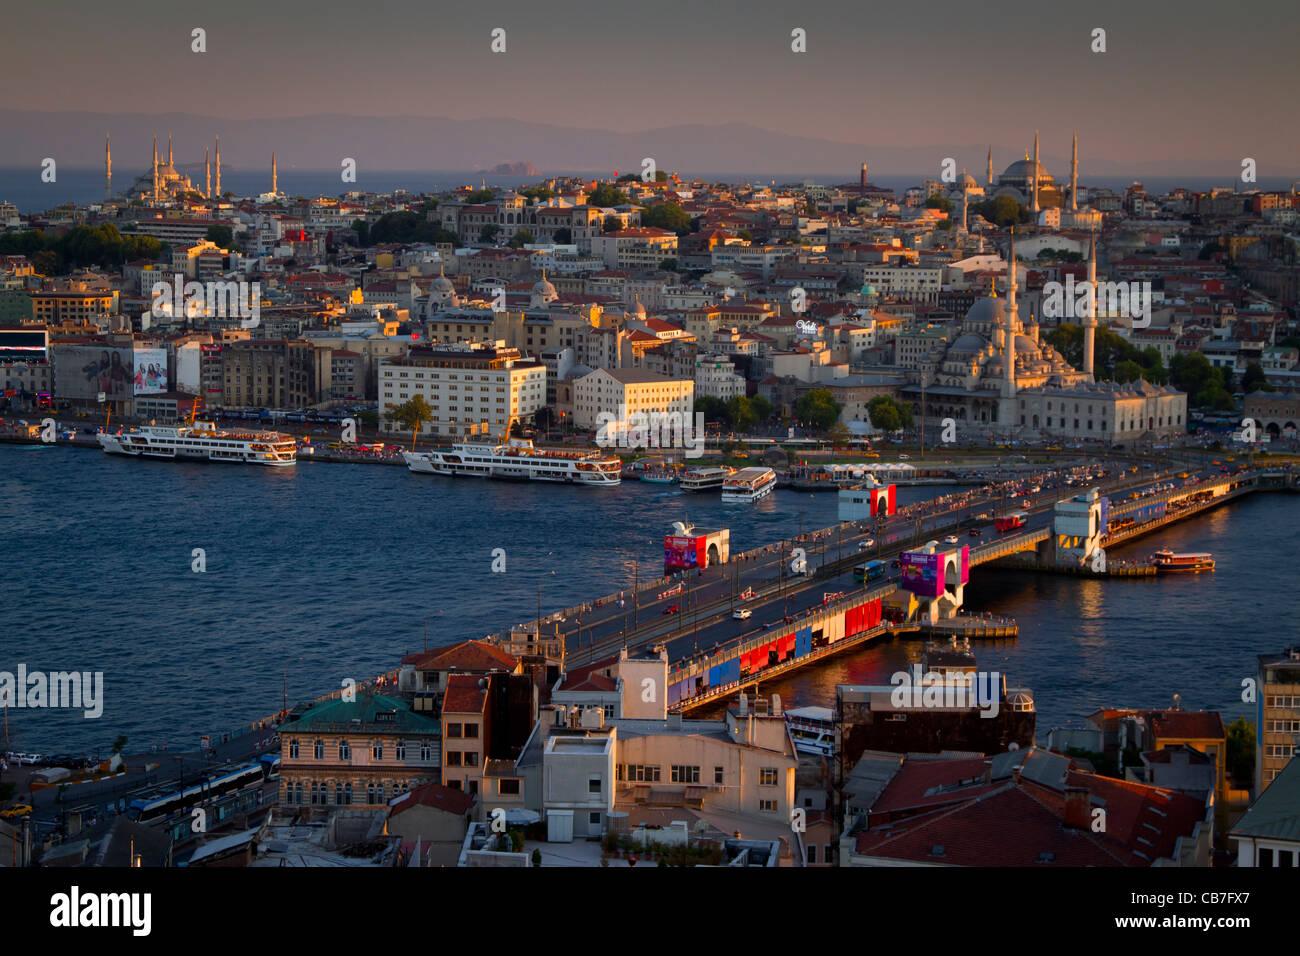 Golden Horn. Istanbul, Turkey. - Stock Image